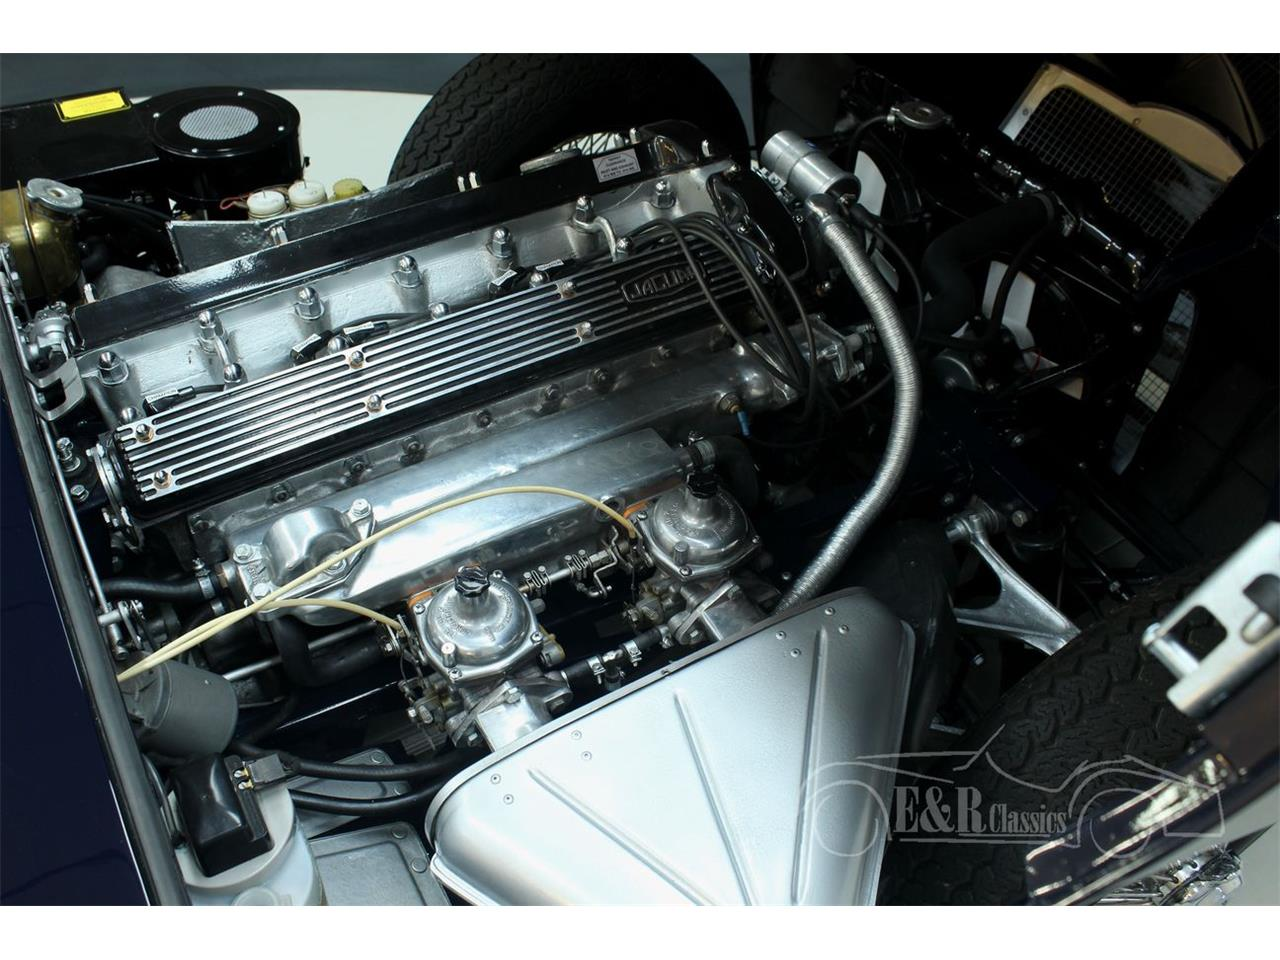 Large Picture of '69 Jaguar E-Type located in Waalwijk Noord-Brabant - $139,400.00 - Q45K